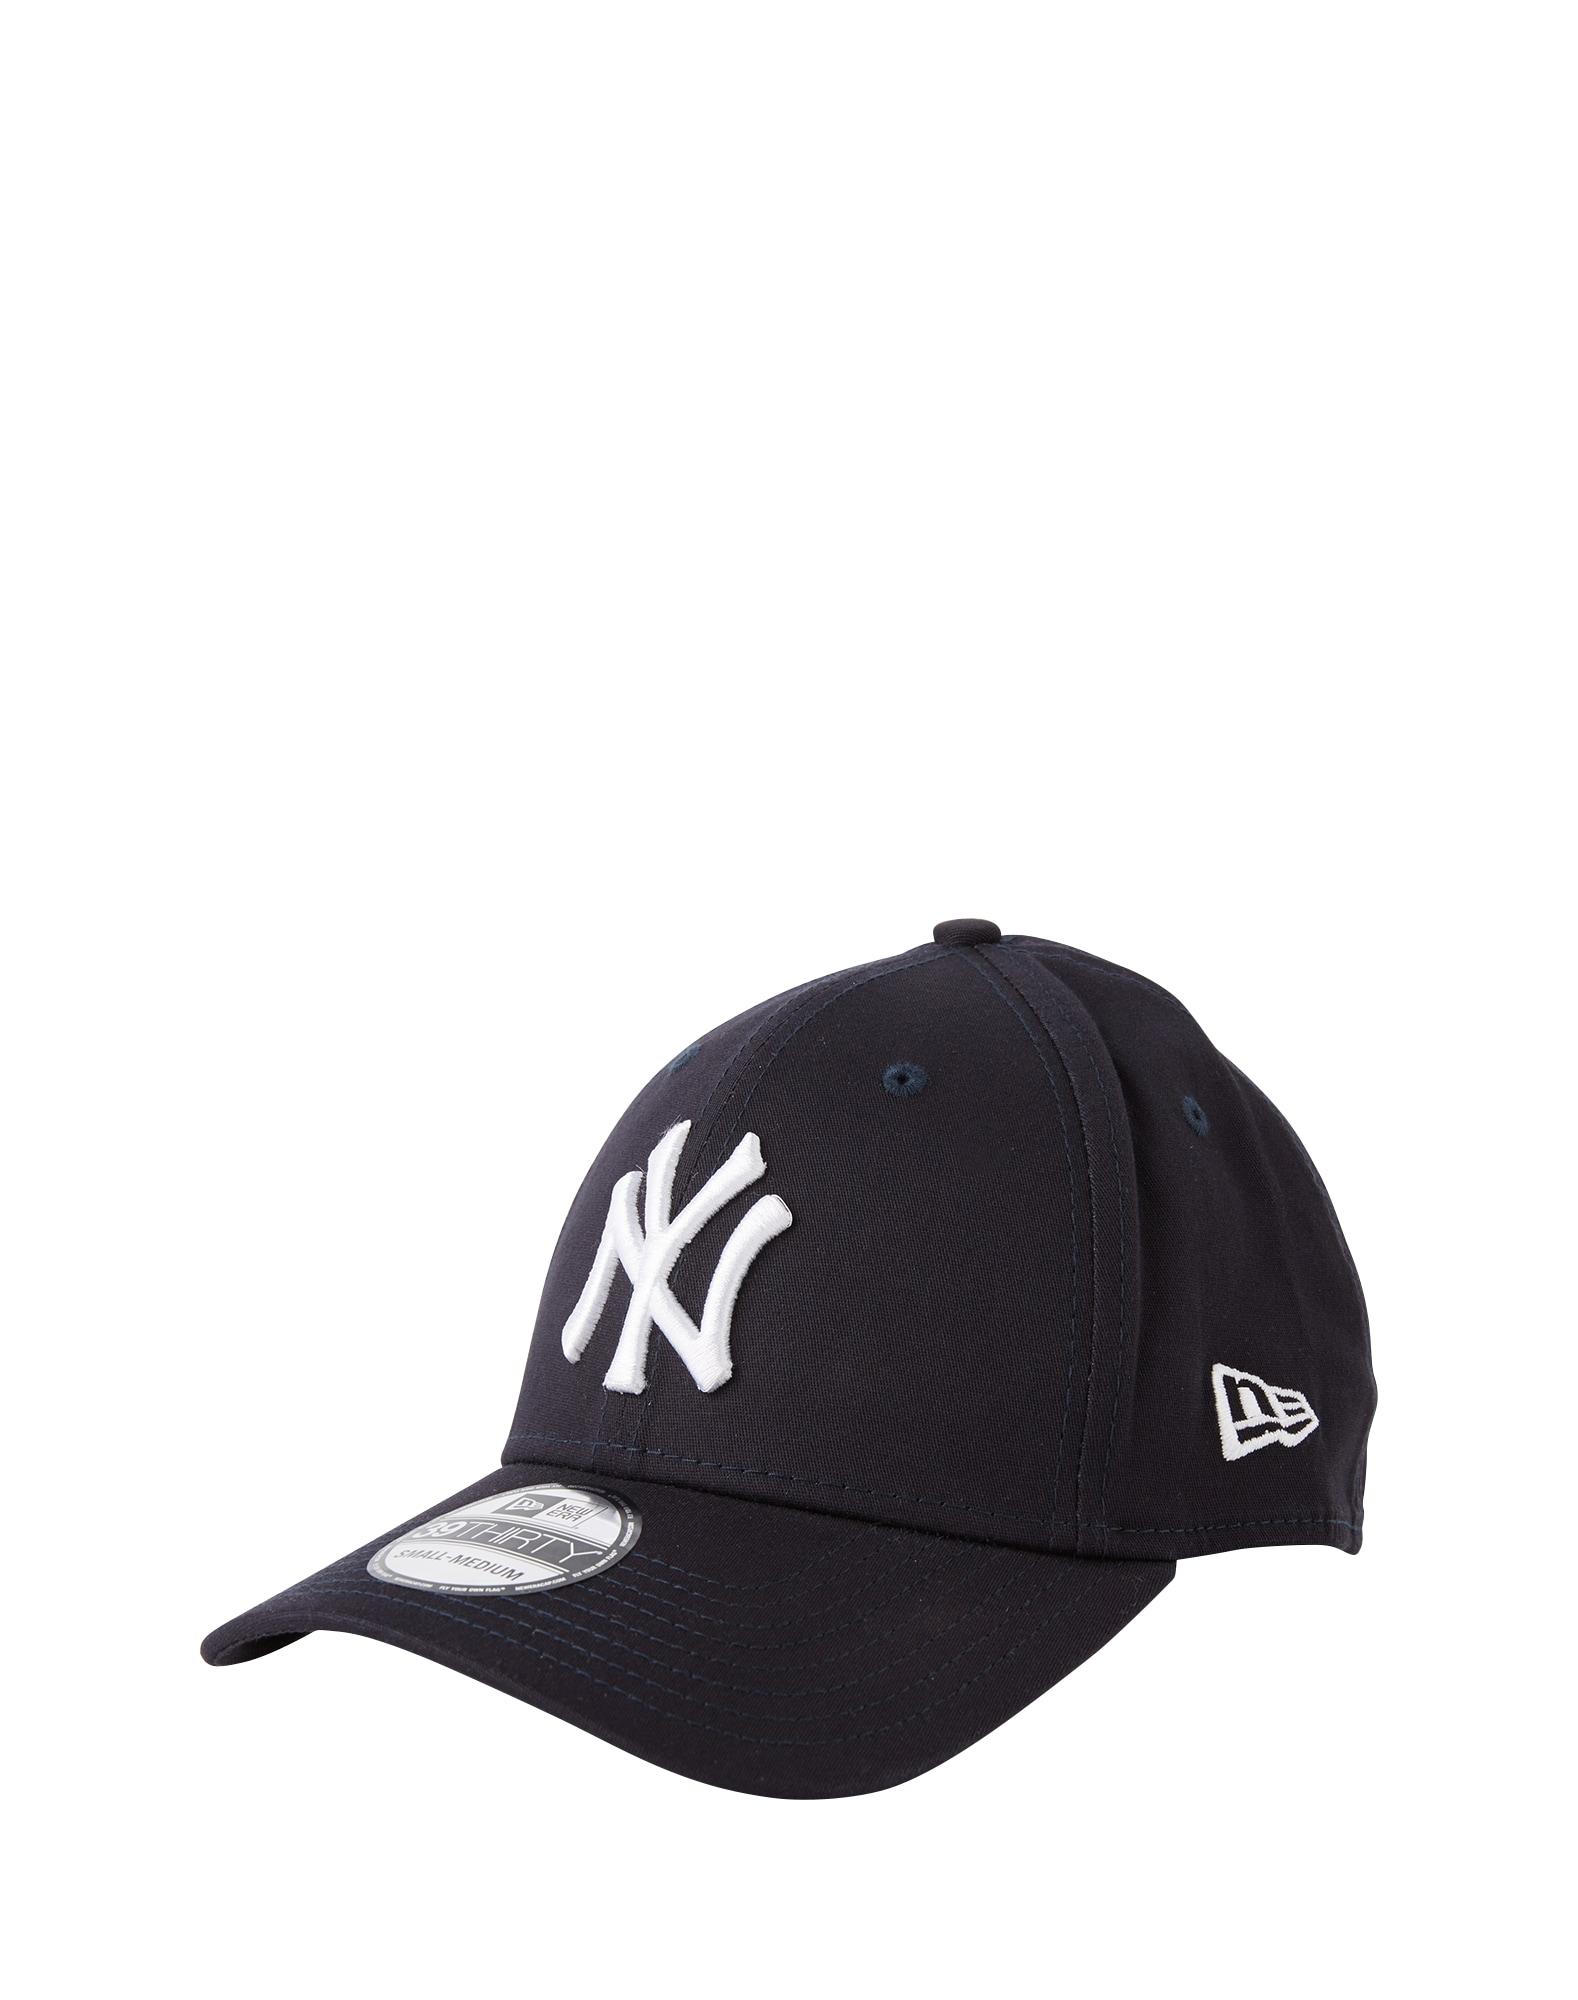 Kšiltovka New York Yankees námořnická modř bílá NEW ERA